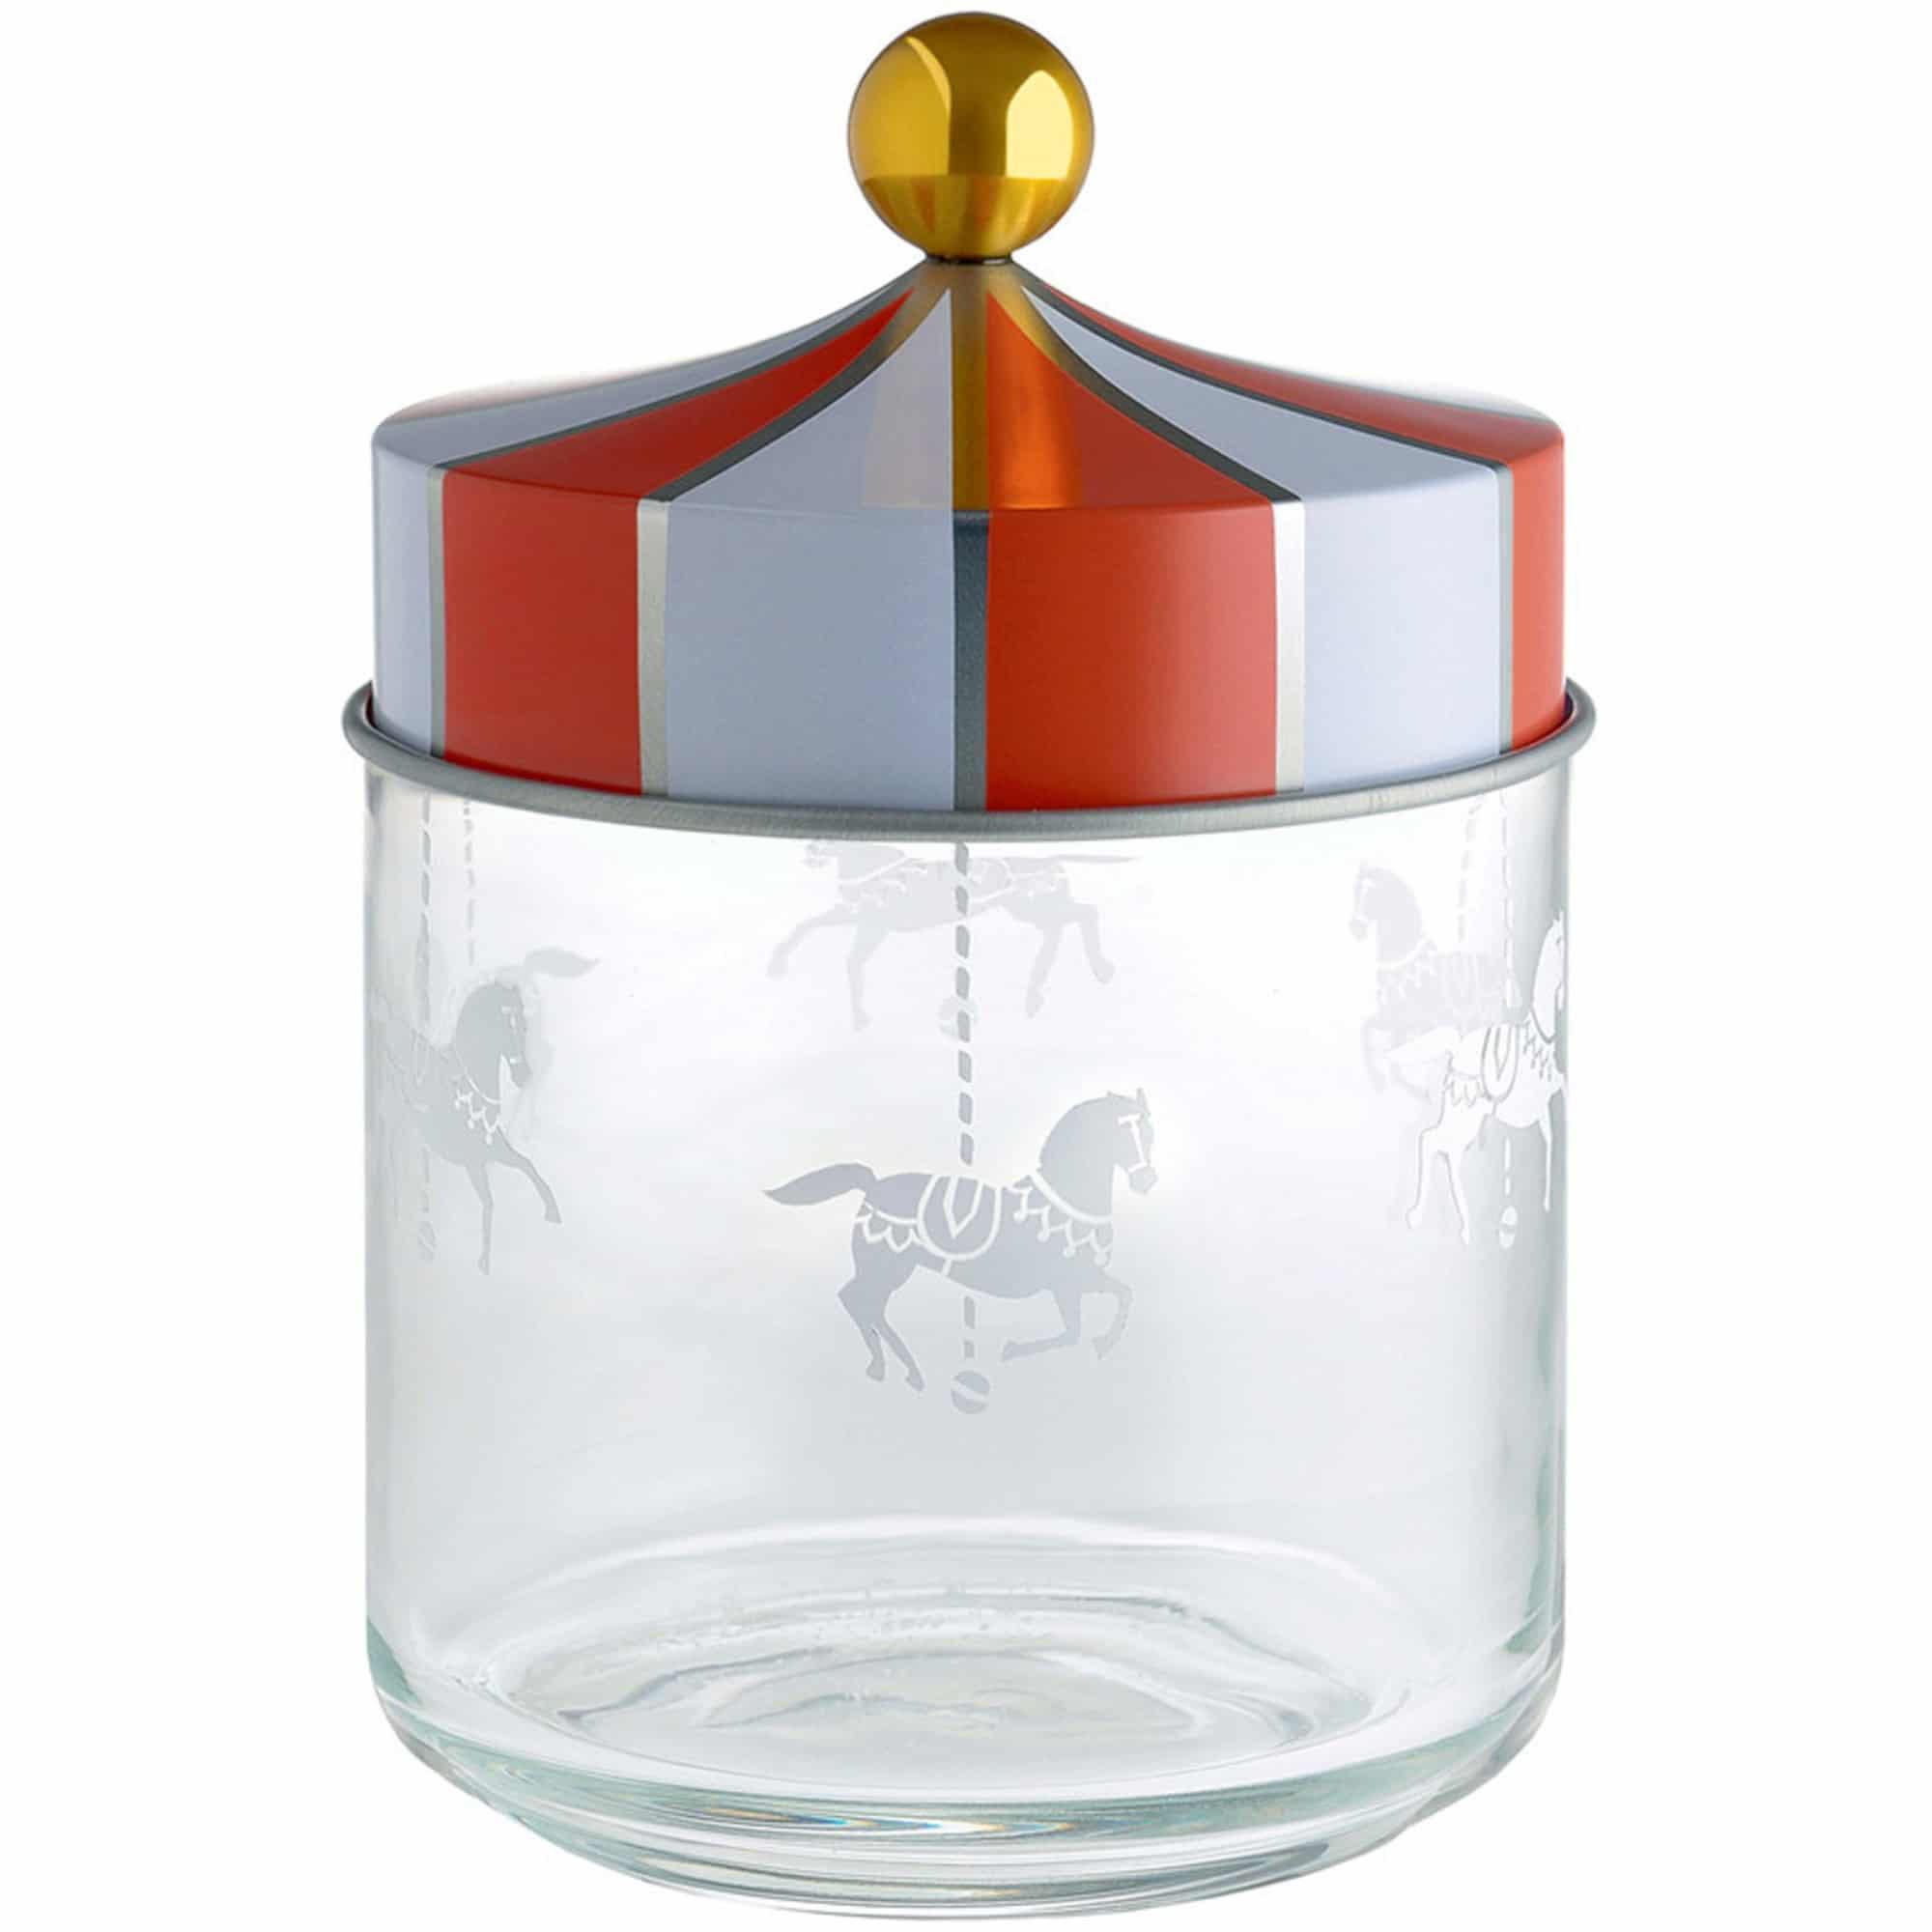 Alessi Circus Glasburk med Hermetiskt lock 75 cl